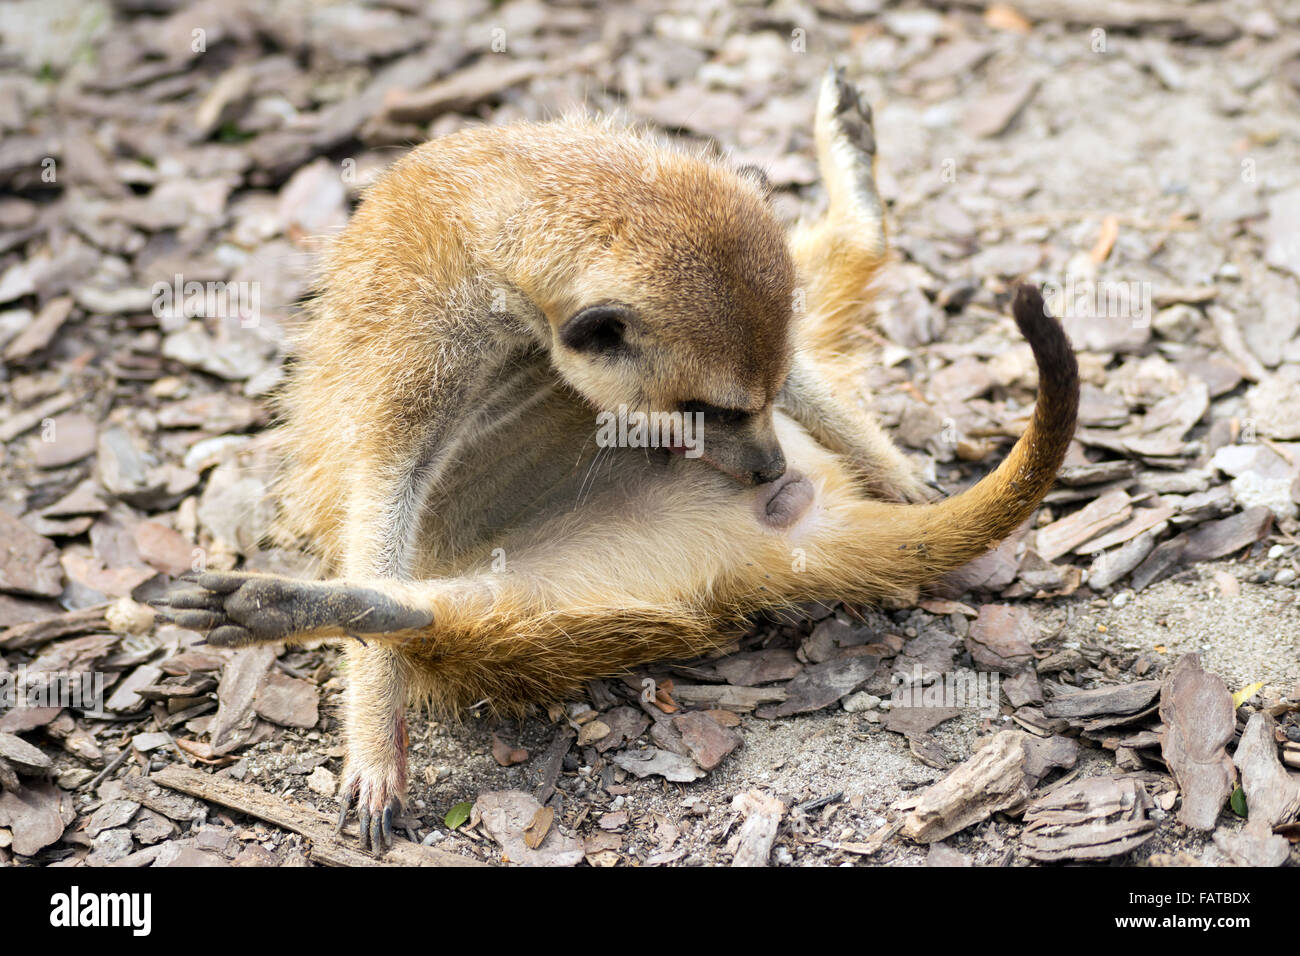 Meerkat (Suricata suricatta) in funny position - Stock Image